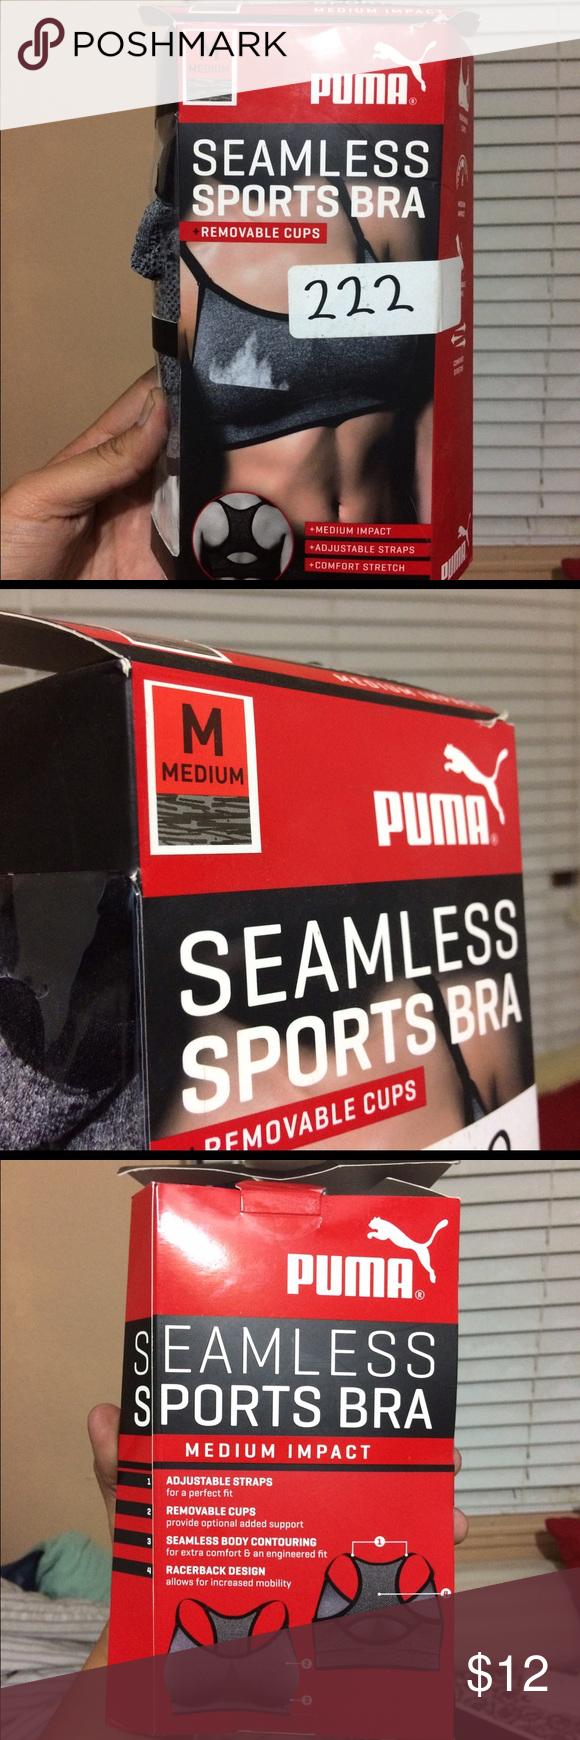 Women's Puma Seamless Sports Bra in Med New in box Puma Seamless Sports Bra in medium black/gray color Puma Intimates & Sleepwear Bras